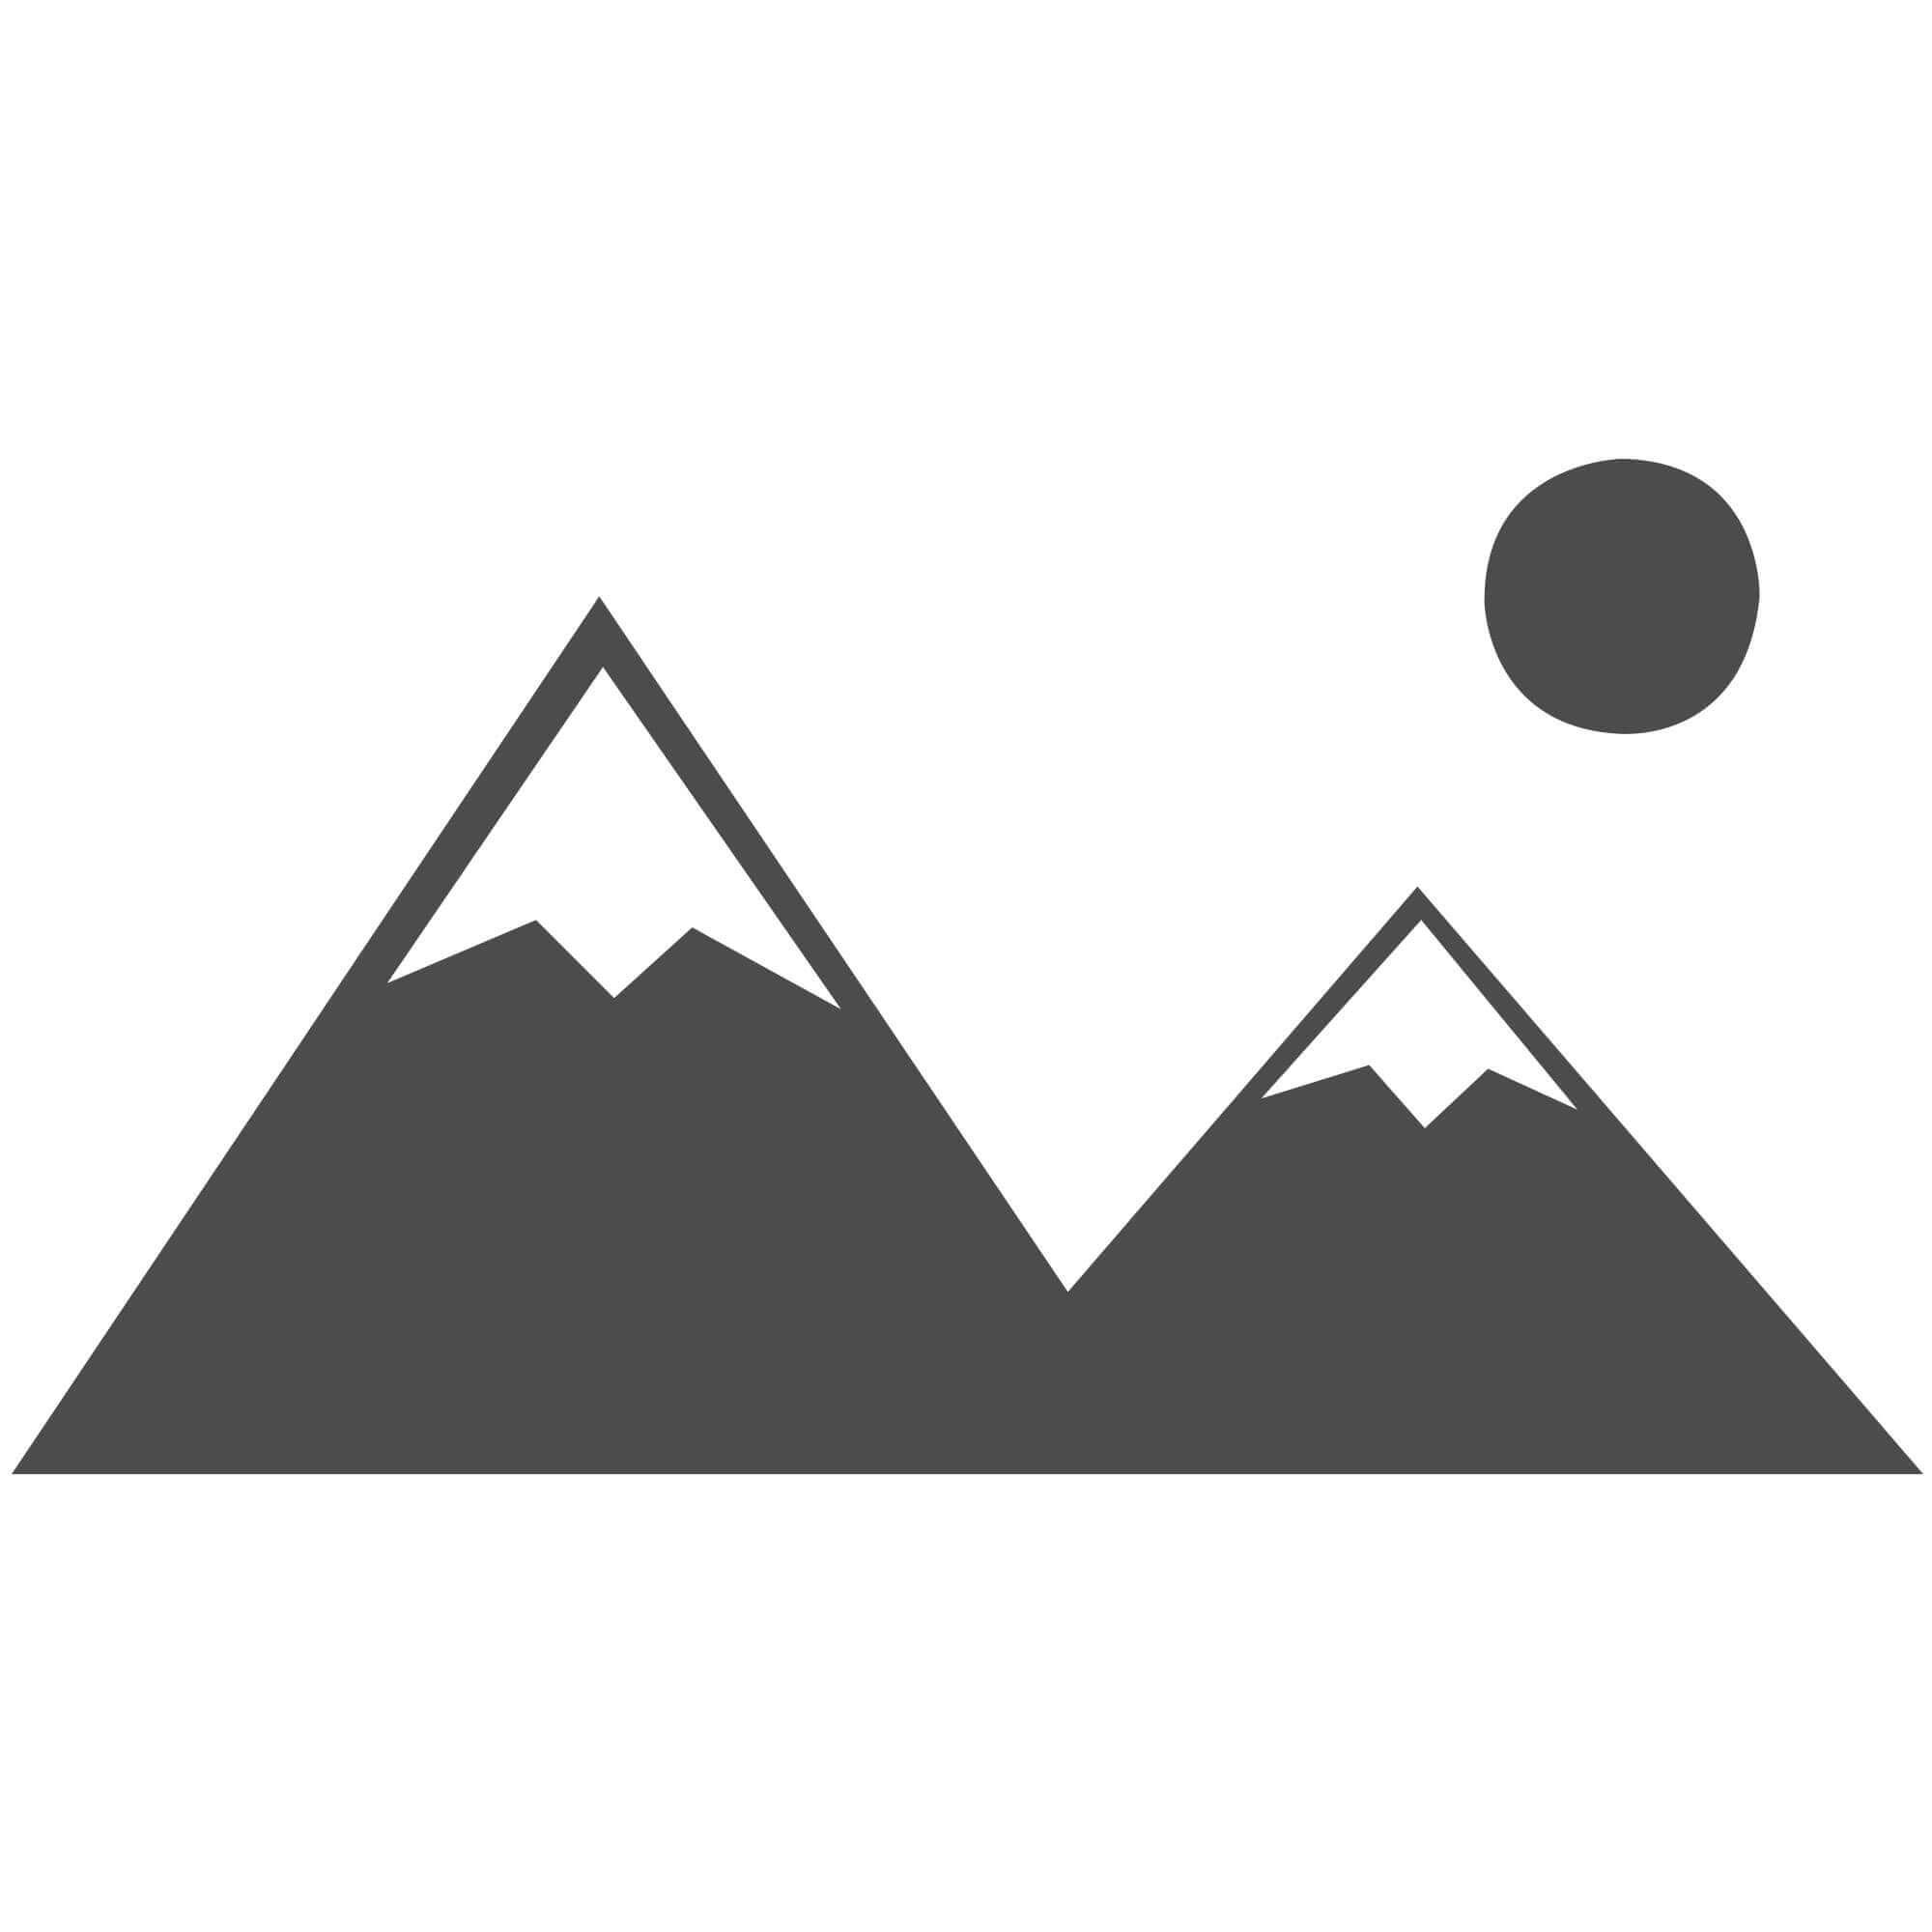 Alexandria white limestone fireplace with Quartz stone chamber #FPW